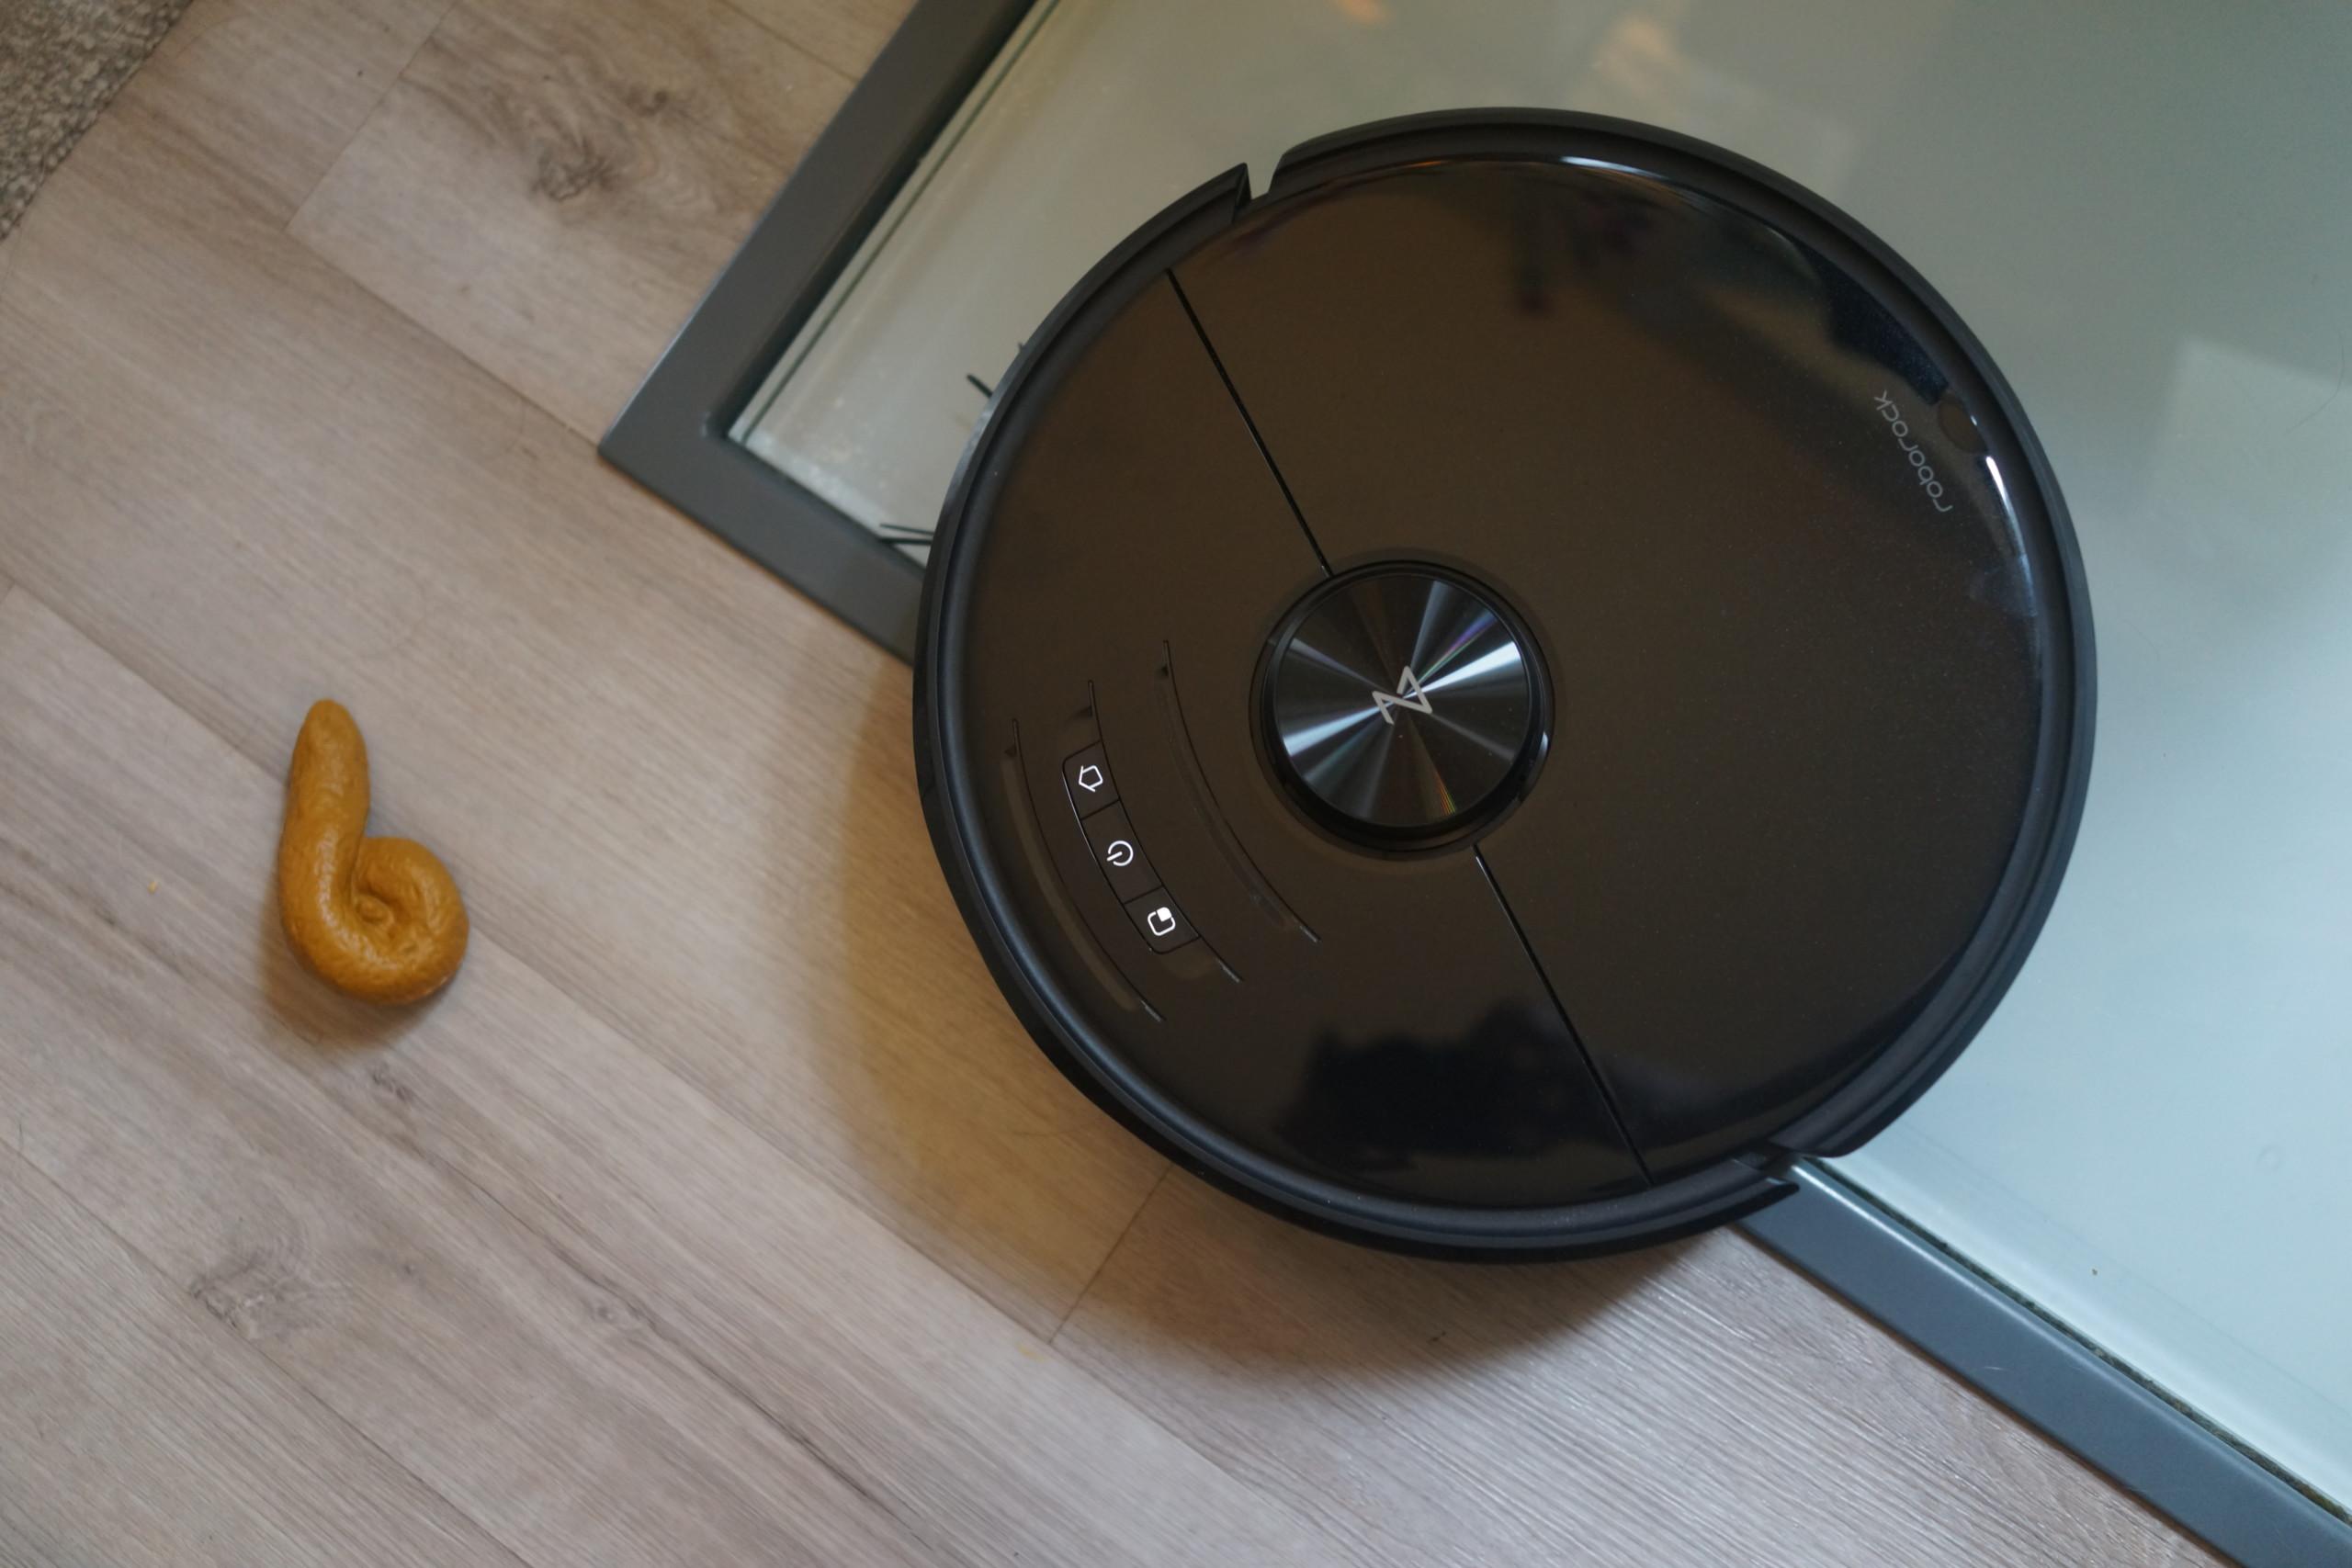 Test du Roborock S6 MaxV : iRobot n'a qu'à bien se tenir